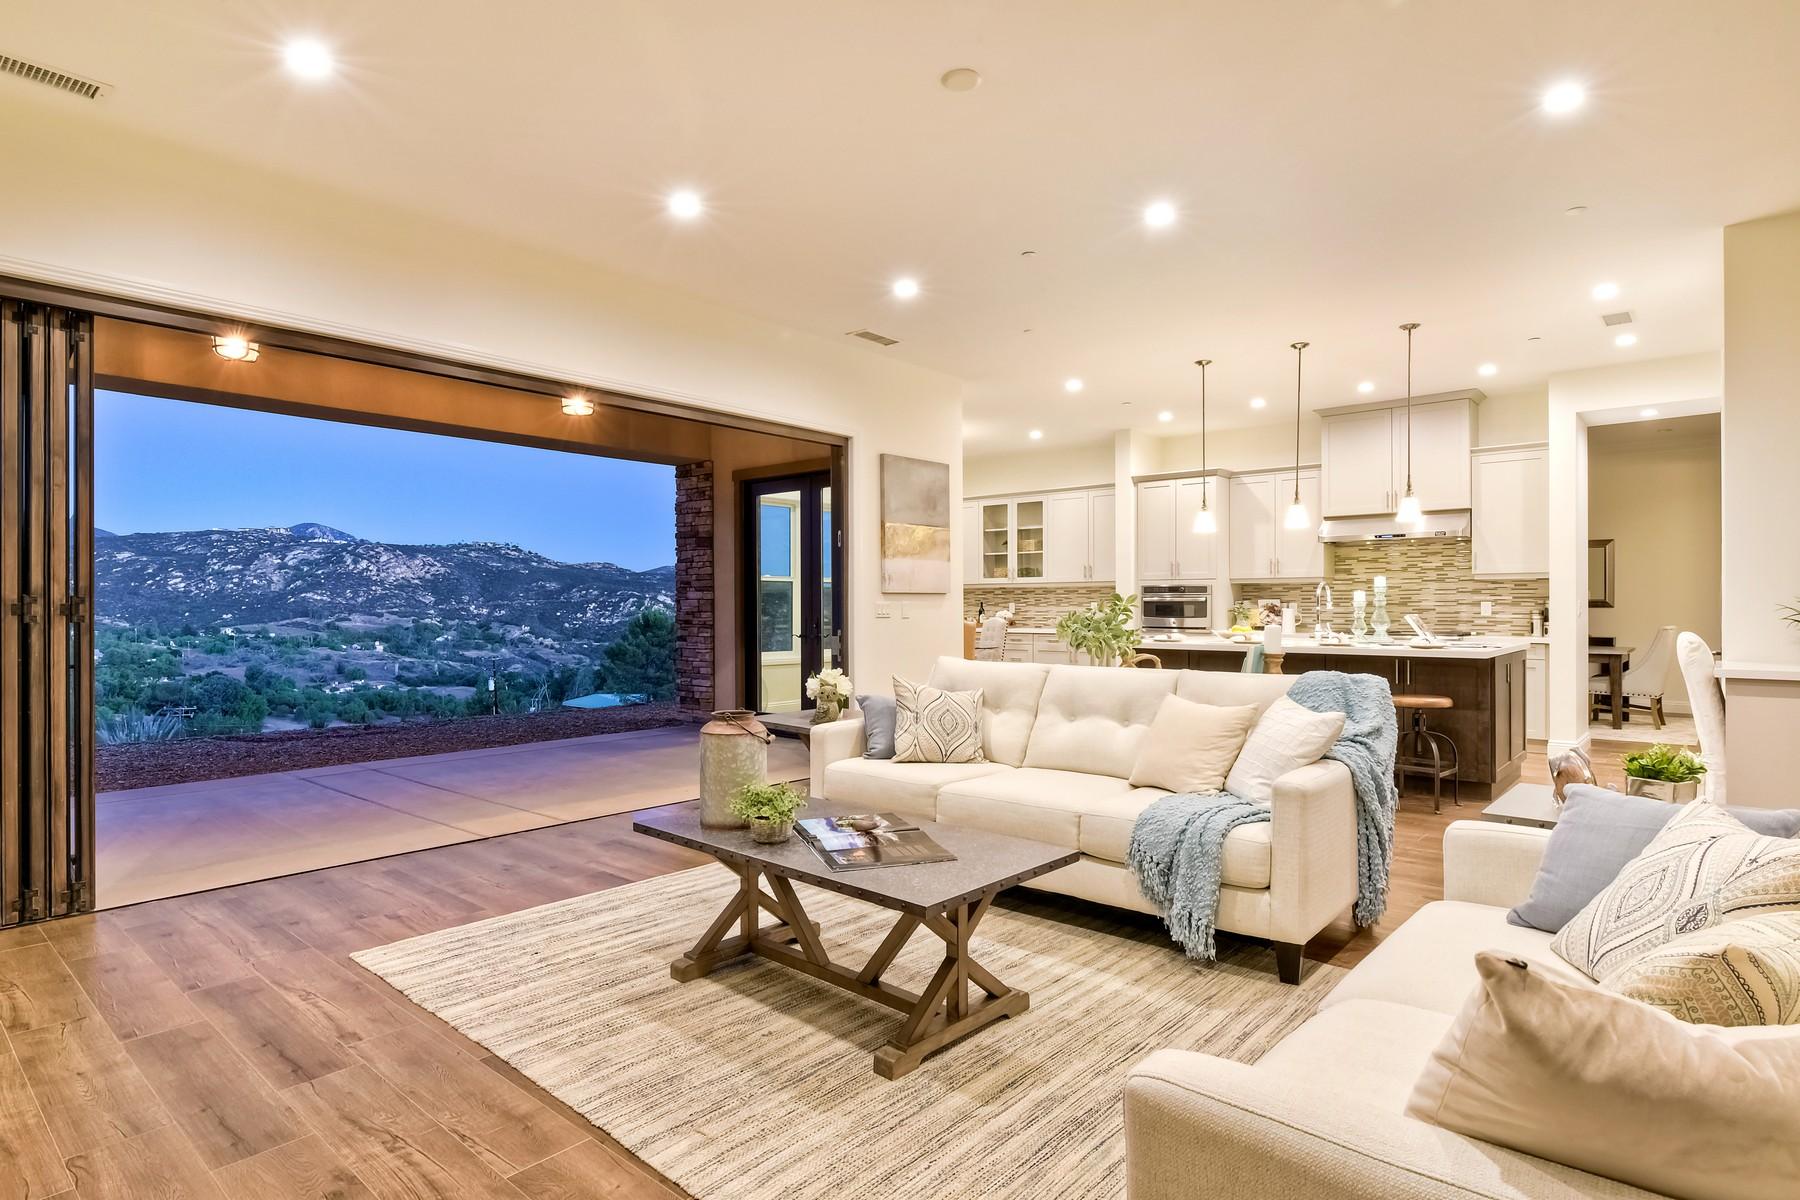 Single Family Home for Active at Markar Rd 15456 Markar Rd Poway, California 92064 United States